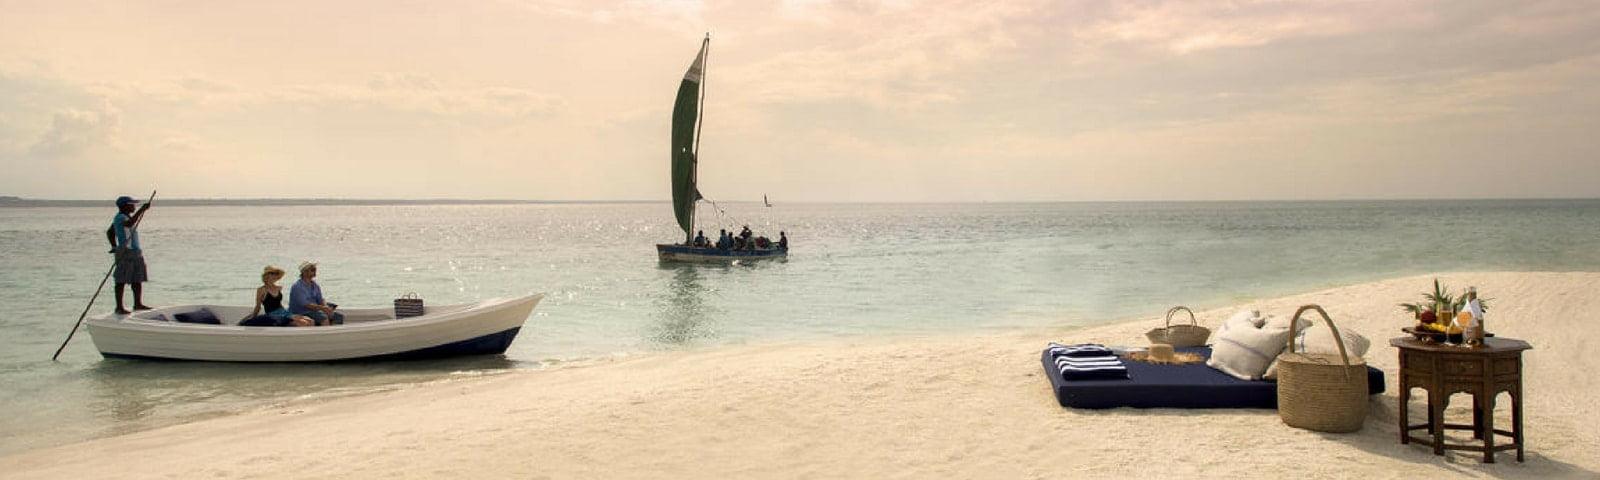 Mozambique Benguerra island andBeyond